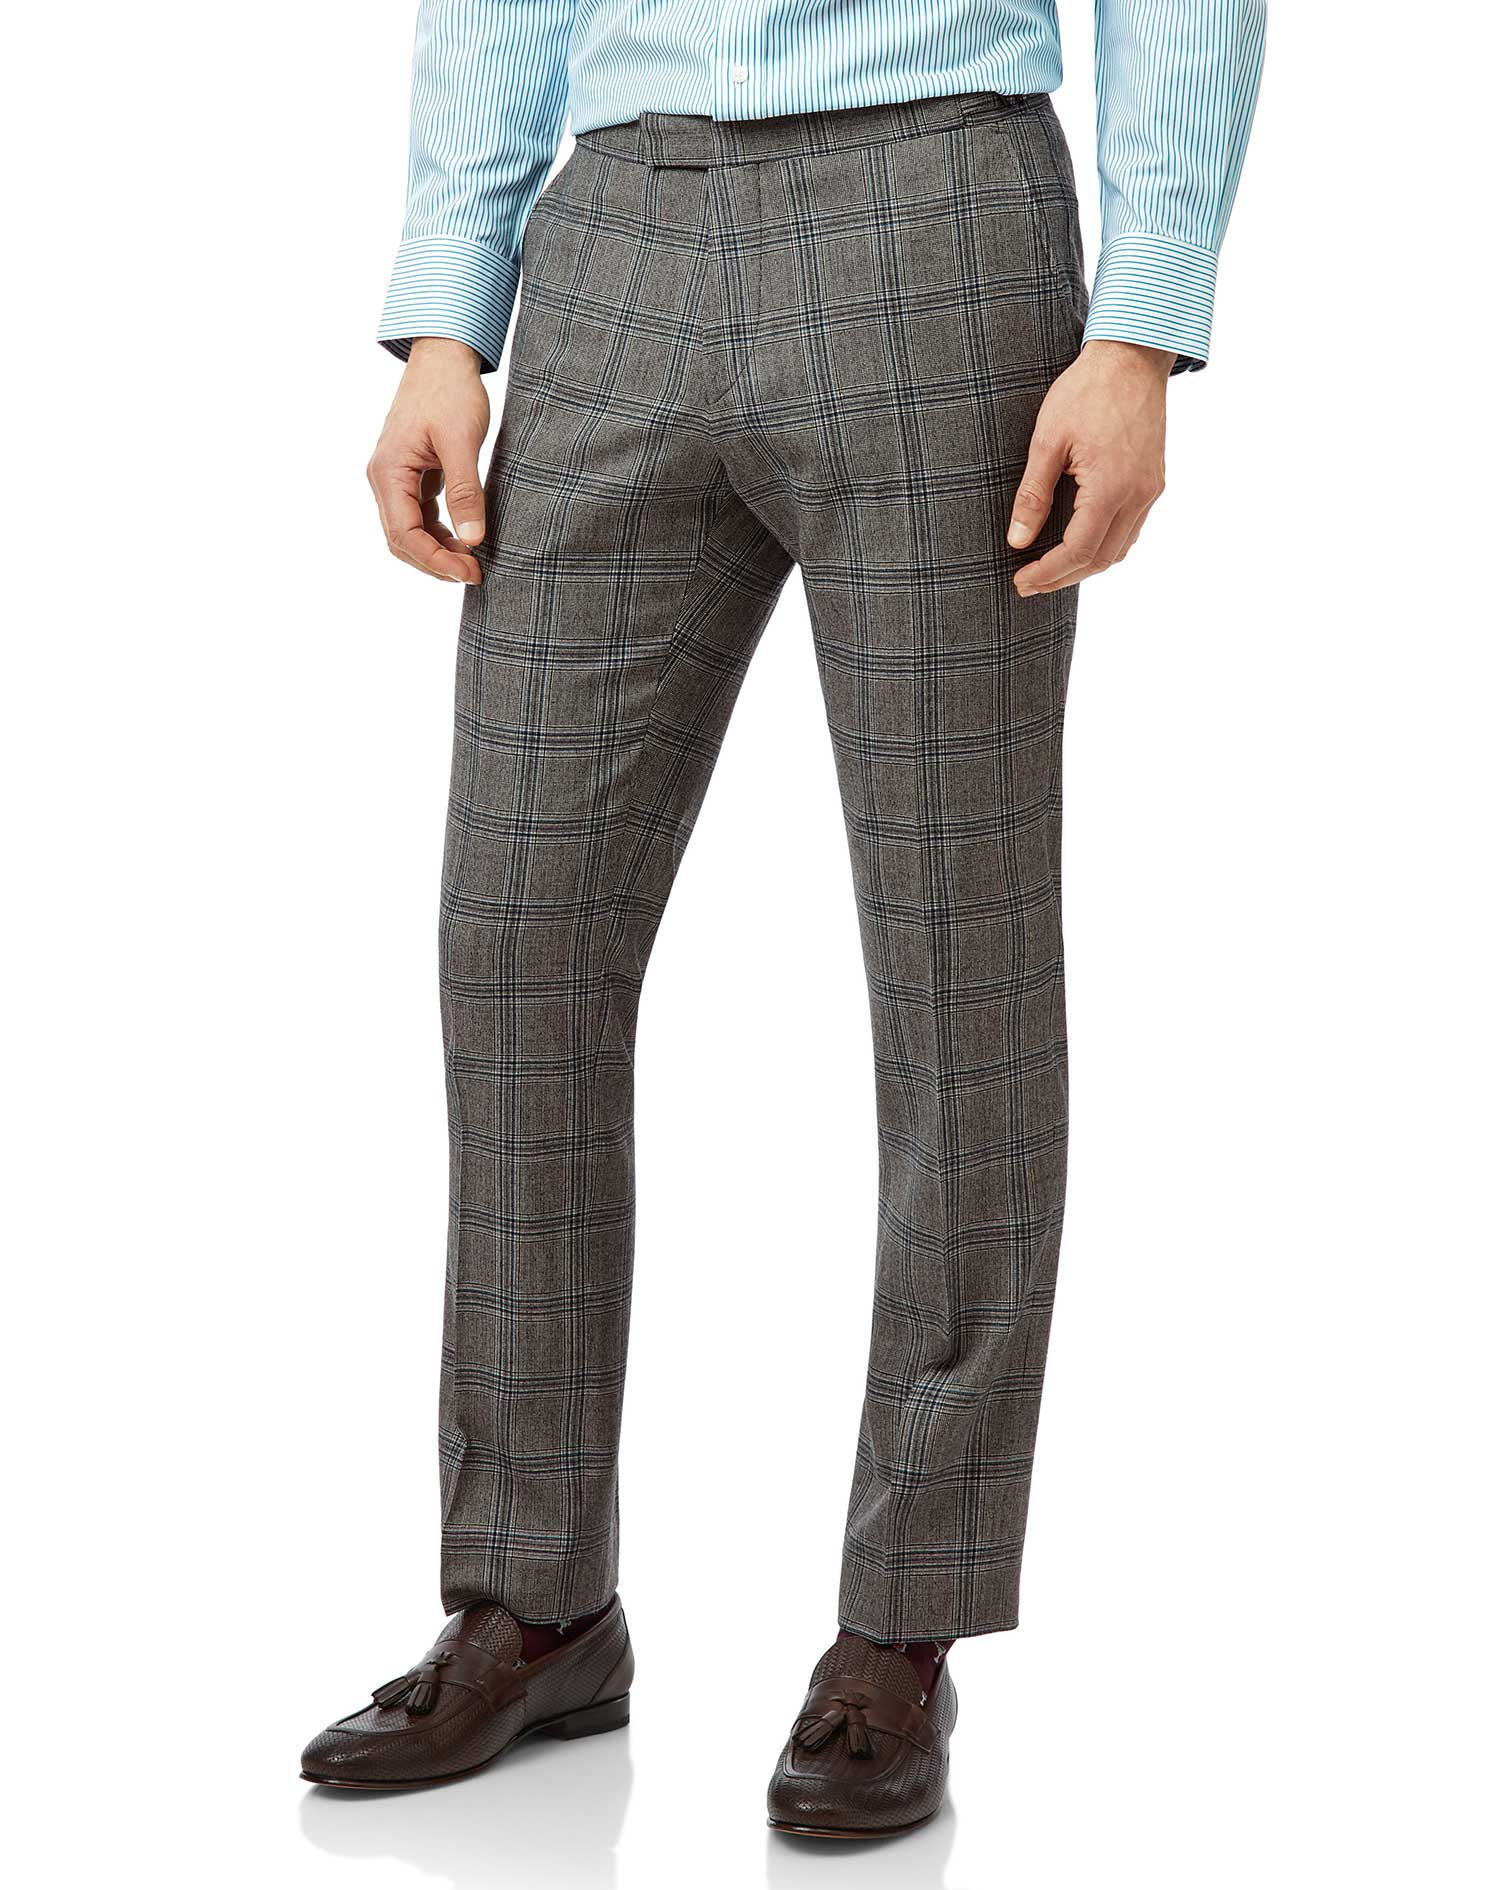 Wool Grey Prince Of Wales Slim Fit British Luxury Suit Trousers